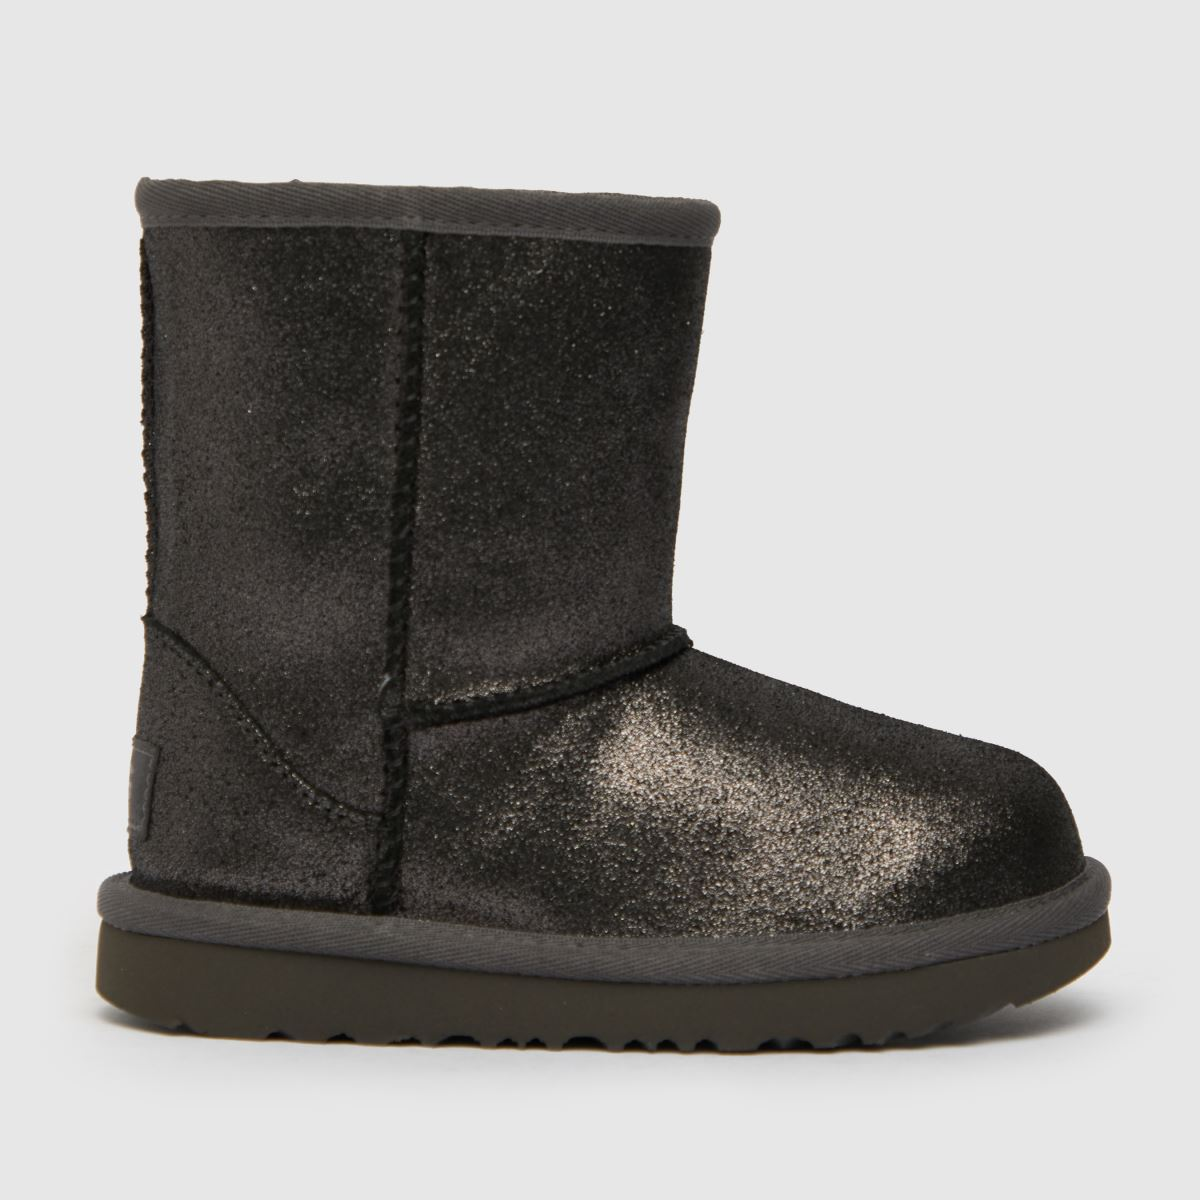 UGG Silver Classic Ii Metallic Tdlr Boots Toddler